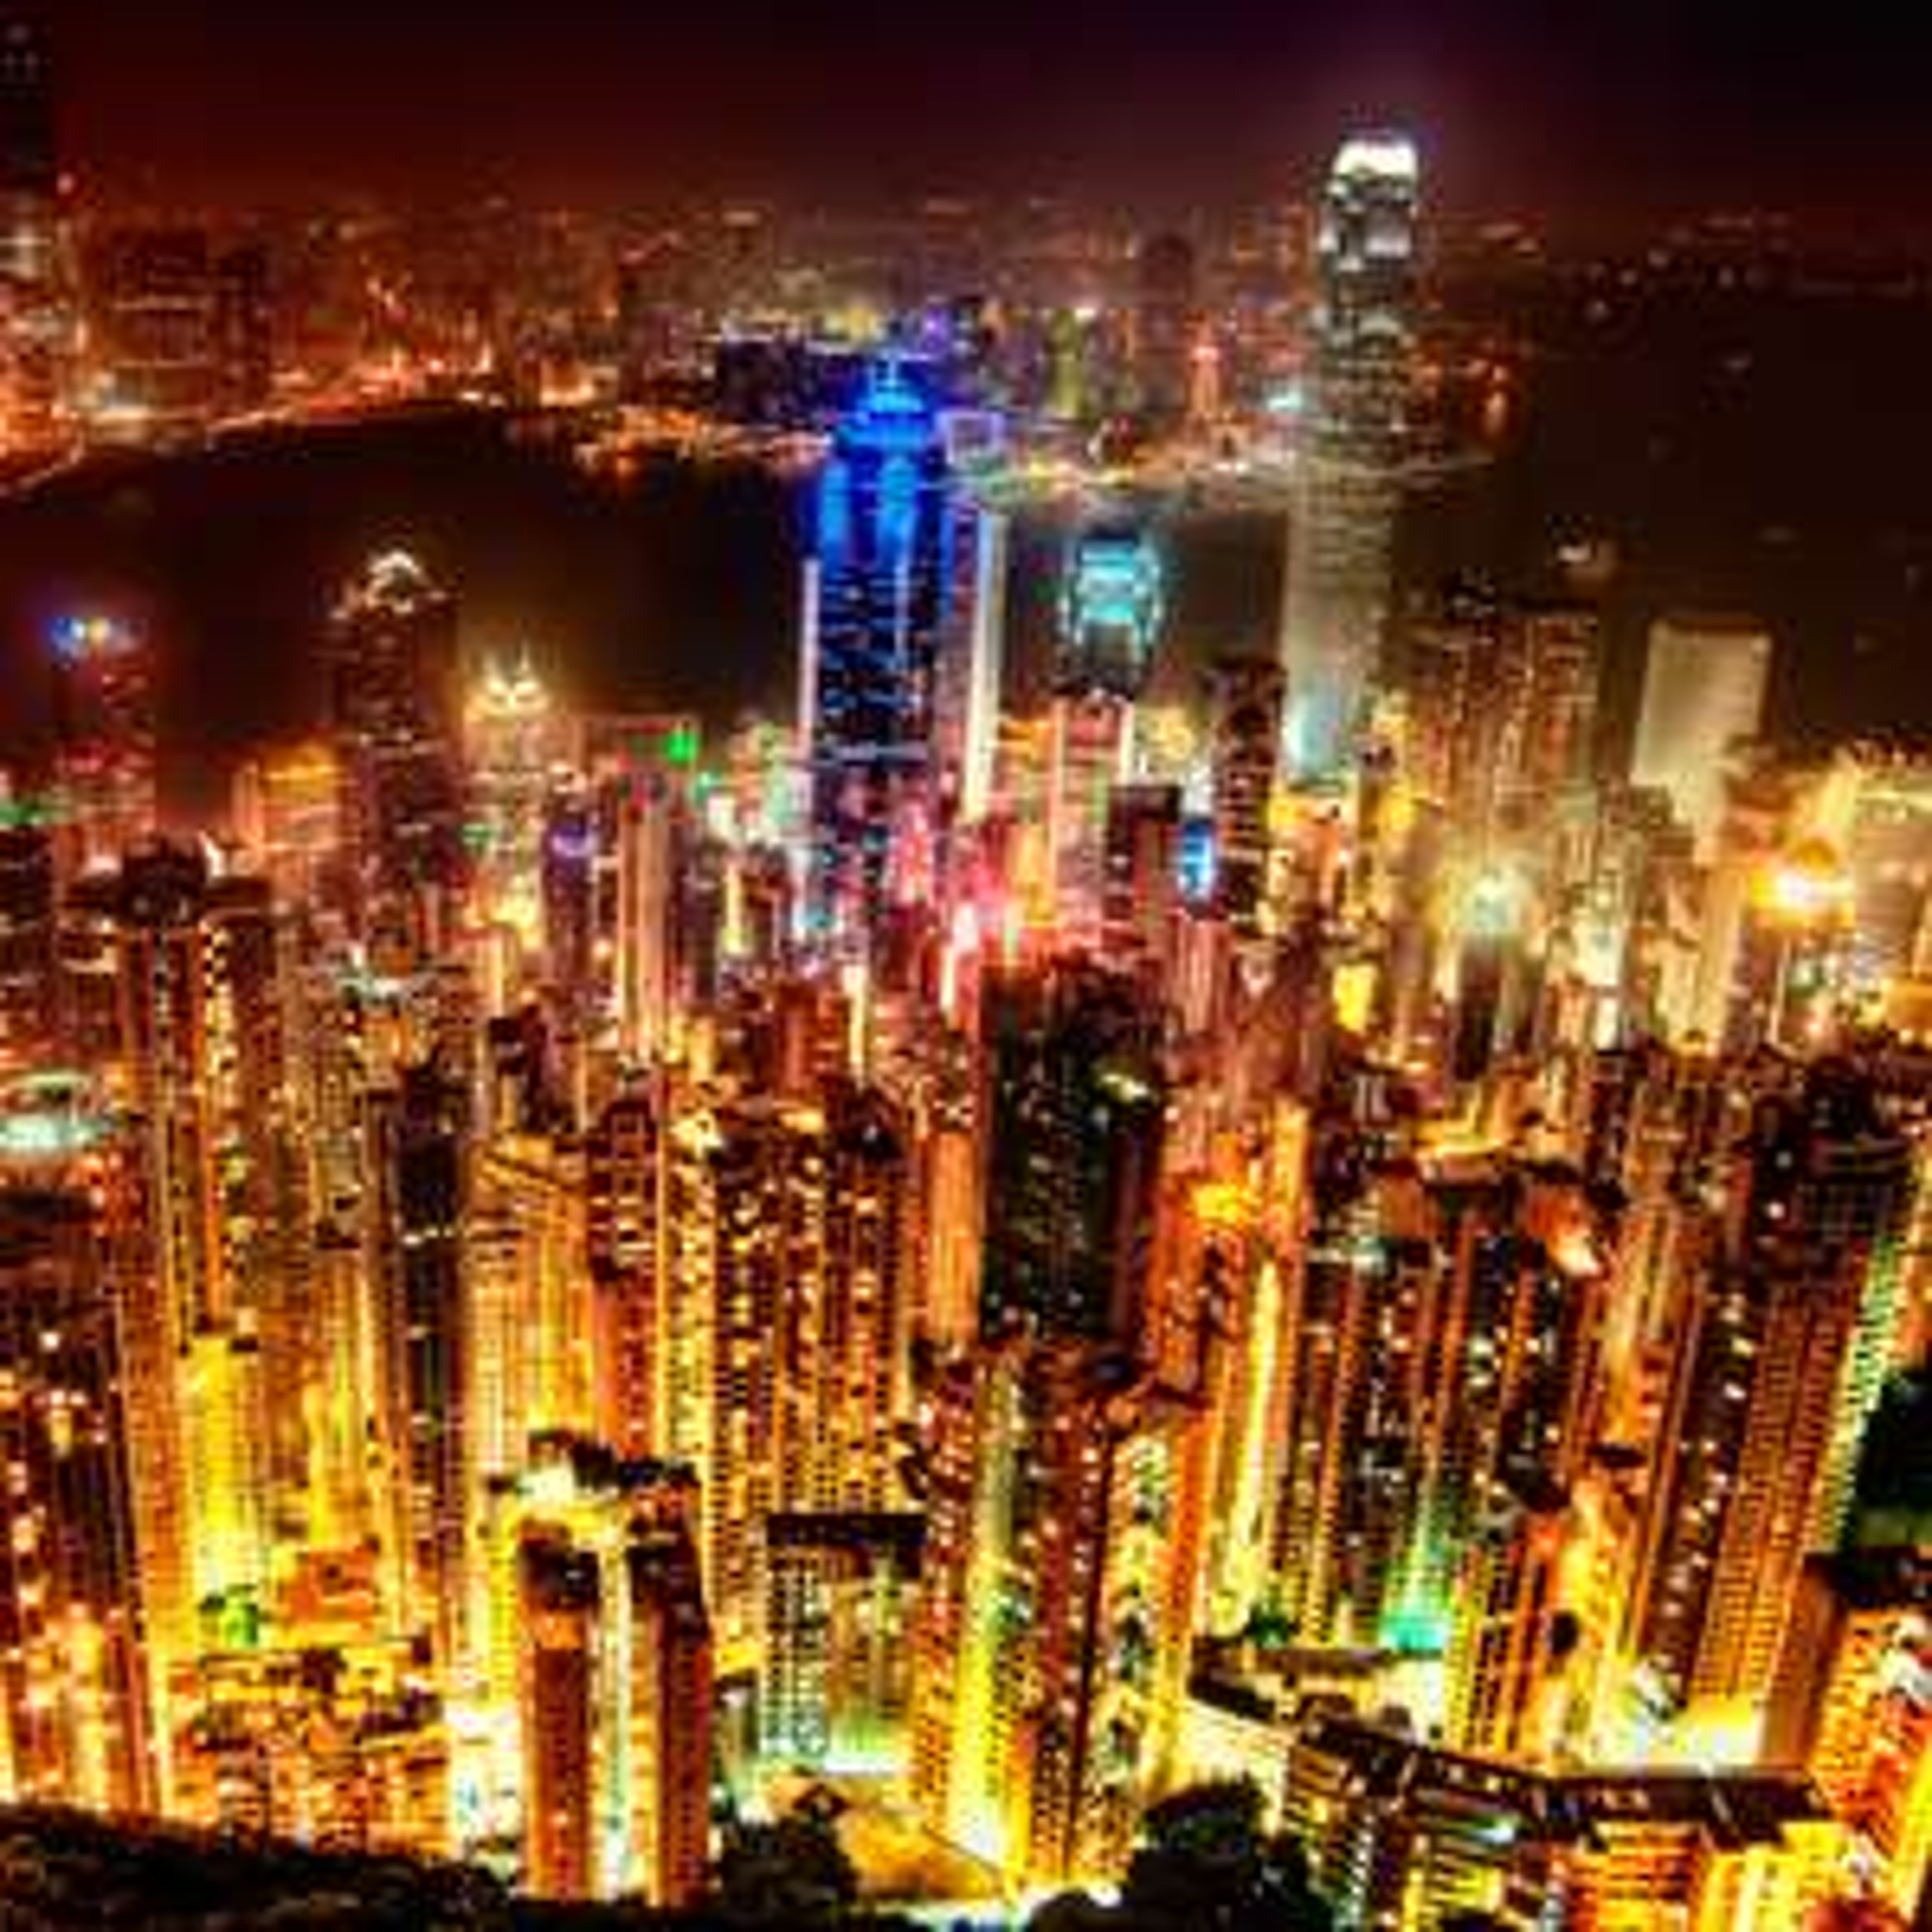 Flüge: Hongkong [Oktober - Dezember / Februar - März] - Hin- und Rückflug von Düsseldorf, München und Frankfurt nach Hongkong ab nur 363€ inkl. Gepäck